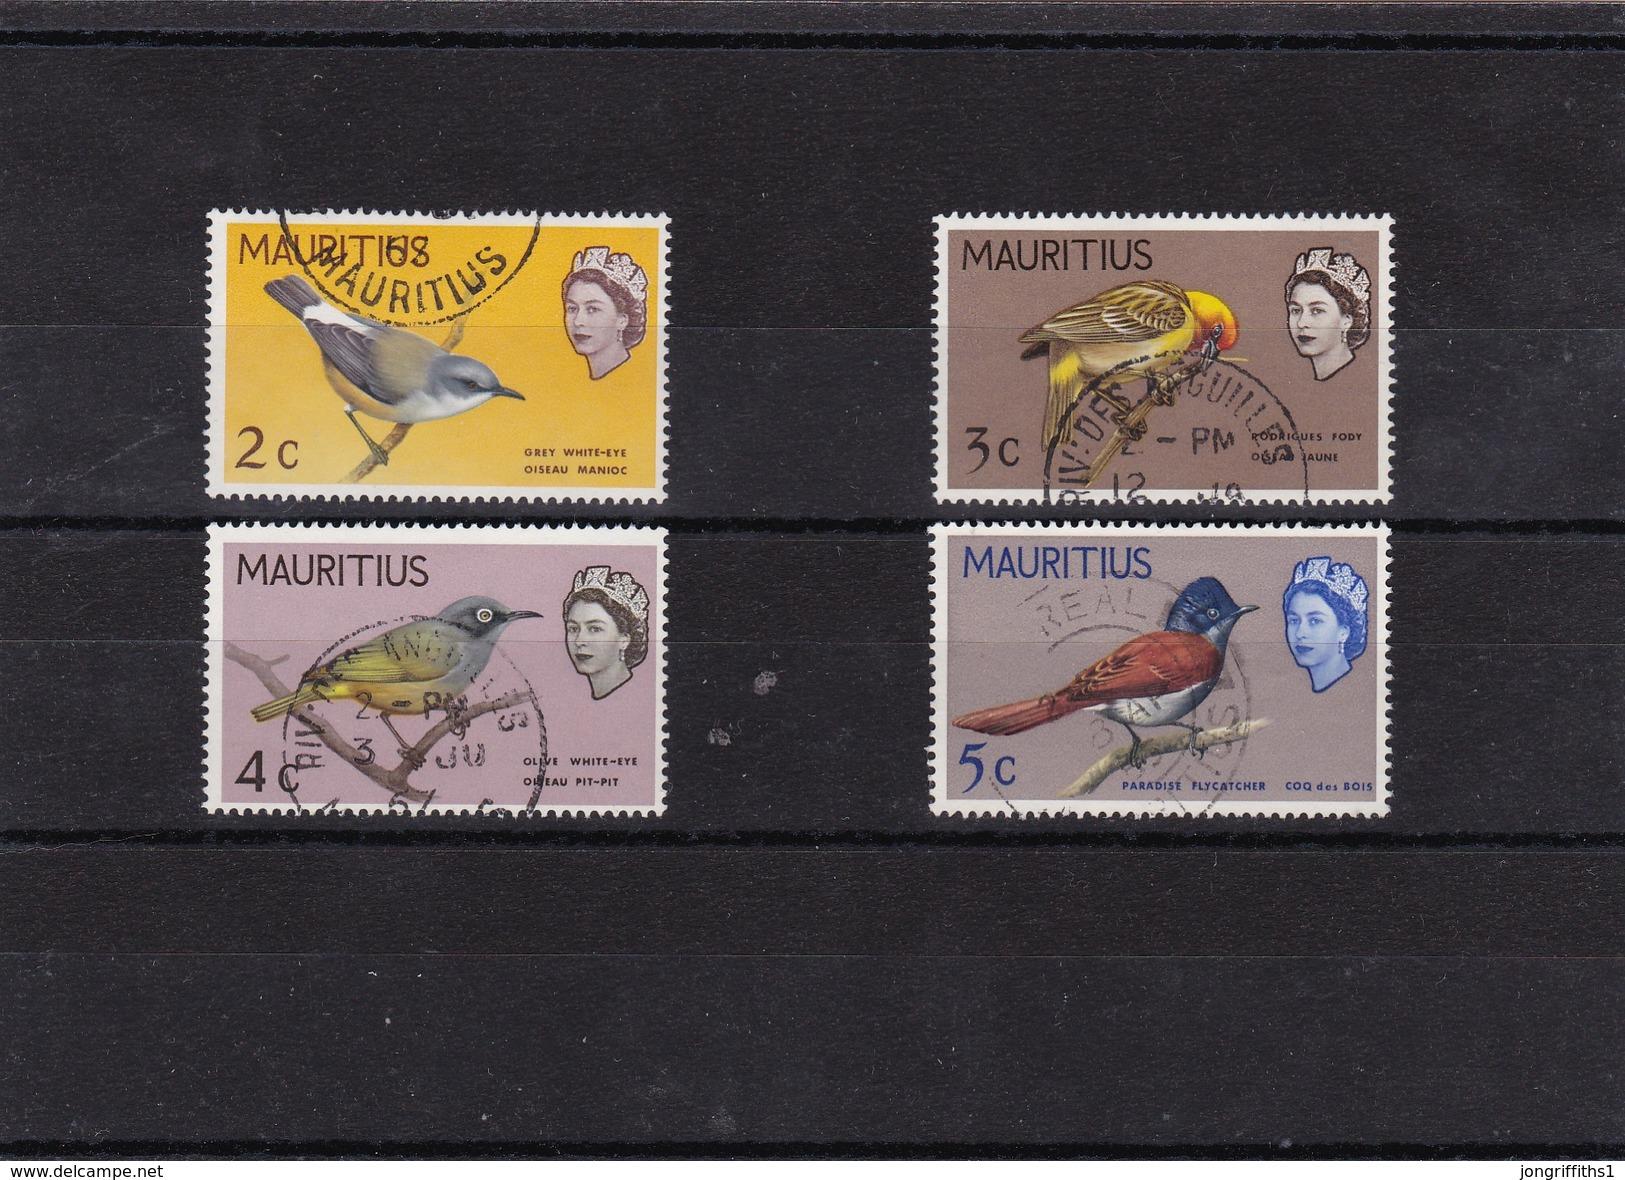 MAURITIUS STAMP SET  LOT 1507 - Mauritius (1968-...)